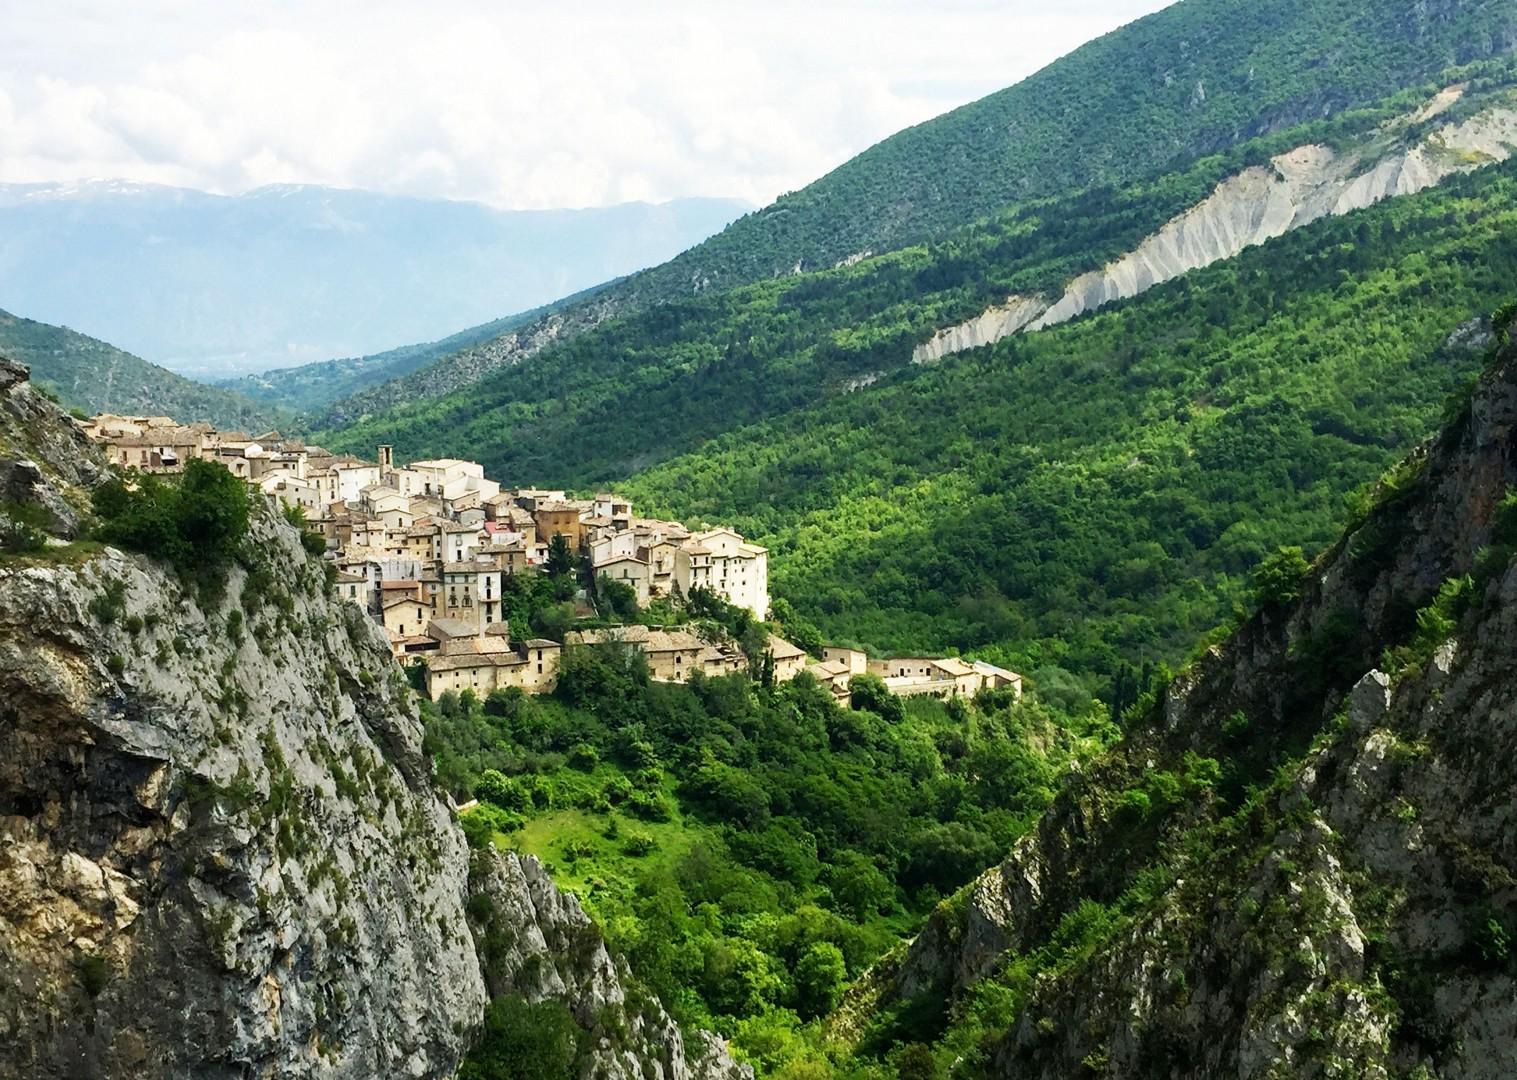 parco-velino-road-cycling-holiday-italy-abruzzo.JPG - Italy - Abruzzo - Appennini d'Abruzzo - Guided Road Cycling Holiday - Road Cycling